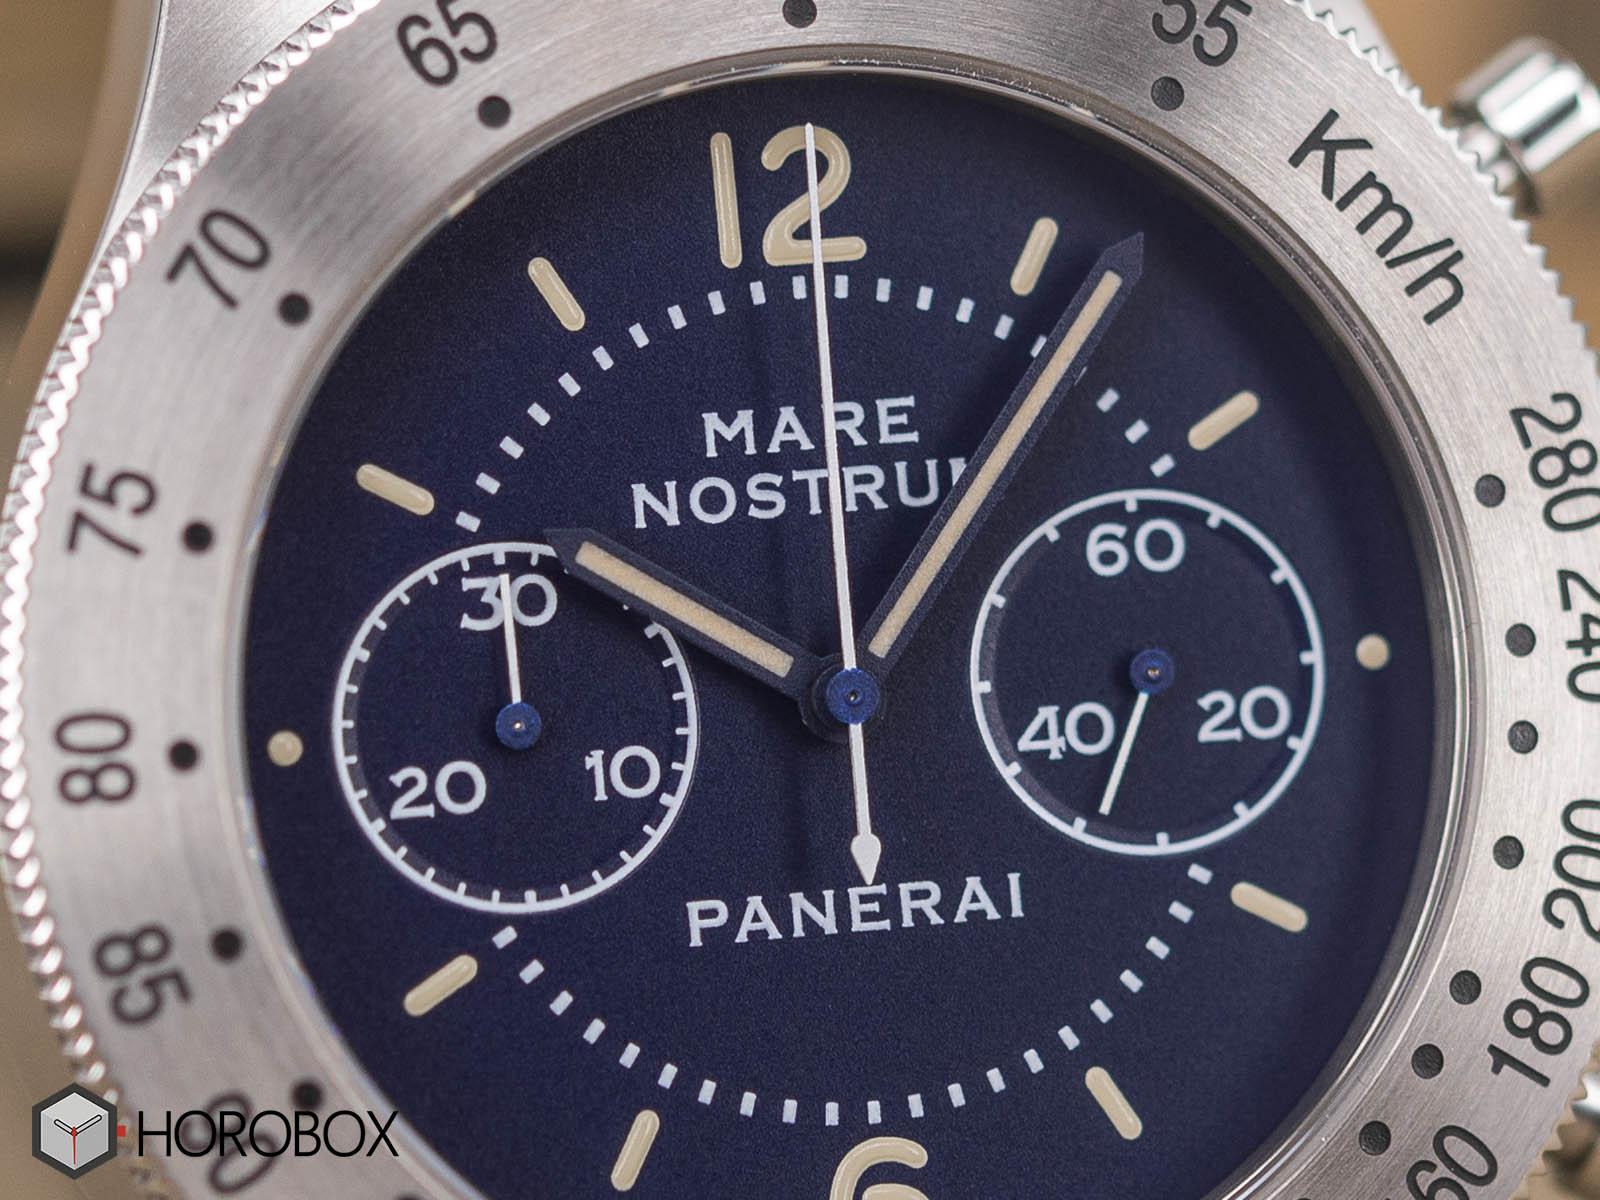 panerai-mare-nostrum-42mm-pam00716-1-.jpg